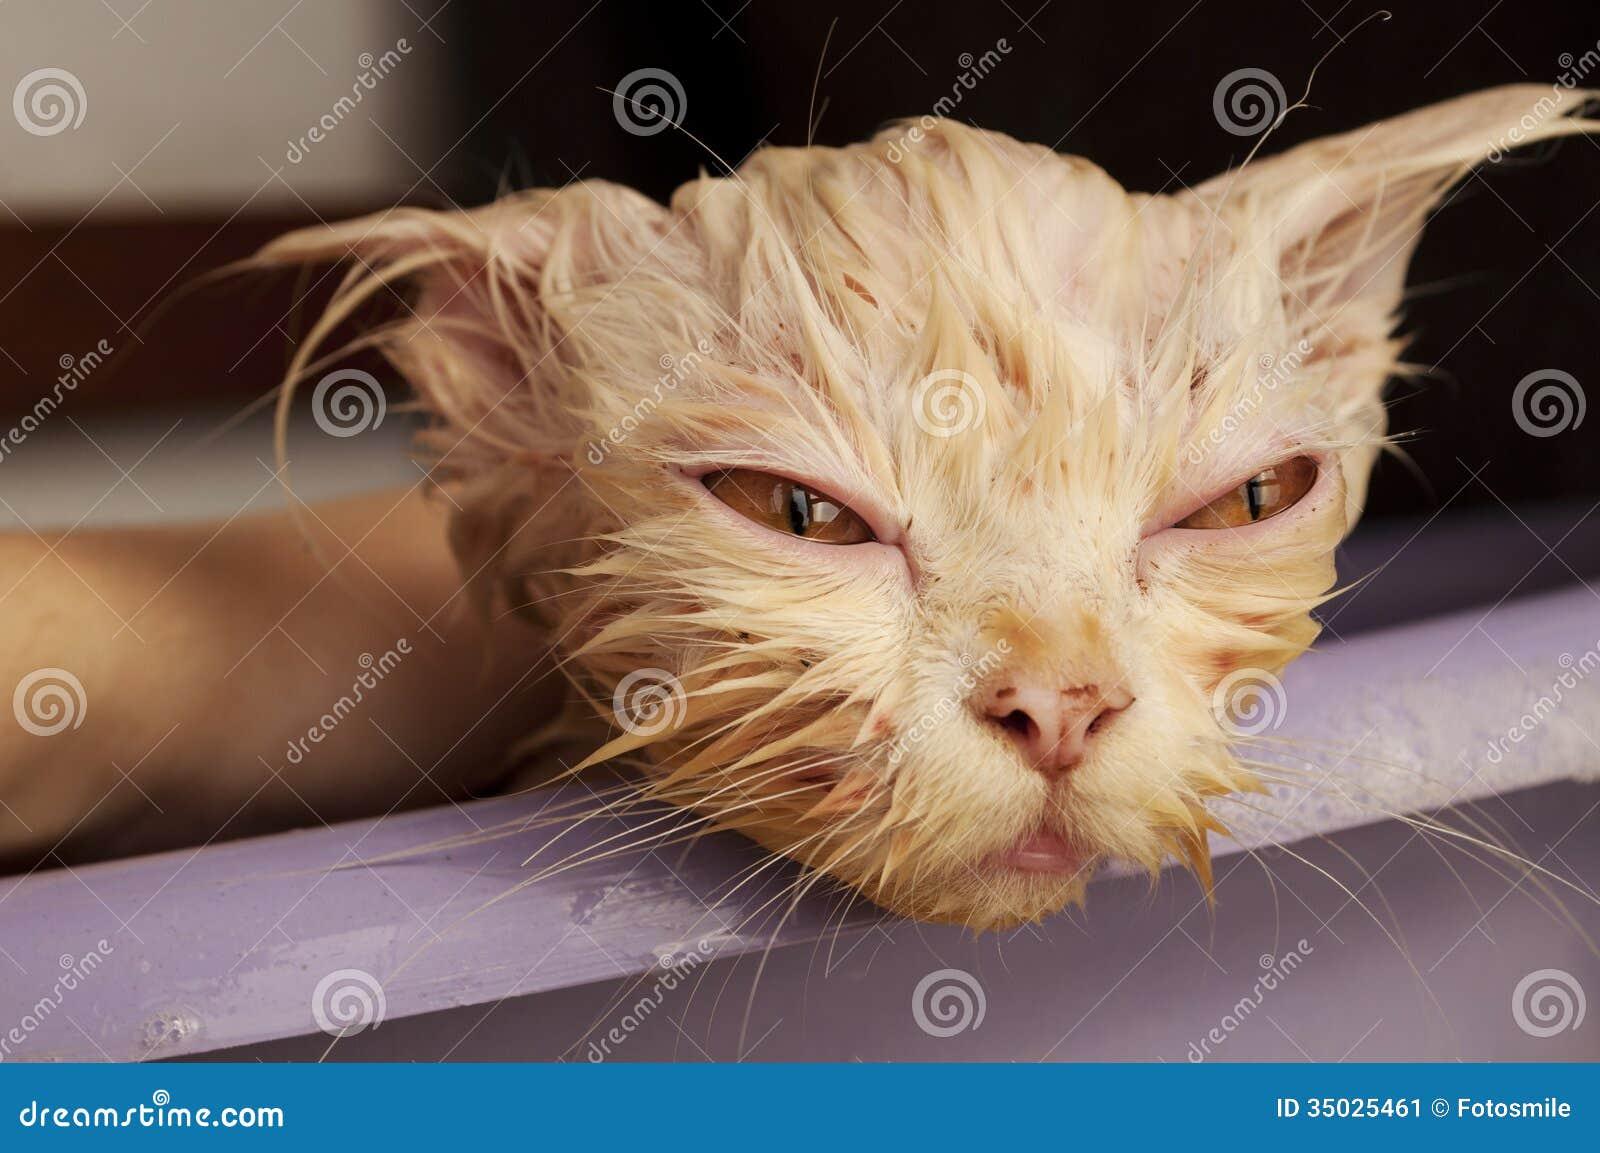 Фото мокрой котенка 13 фотография